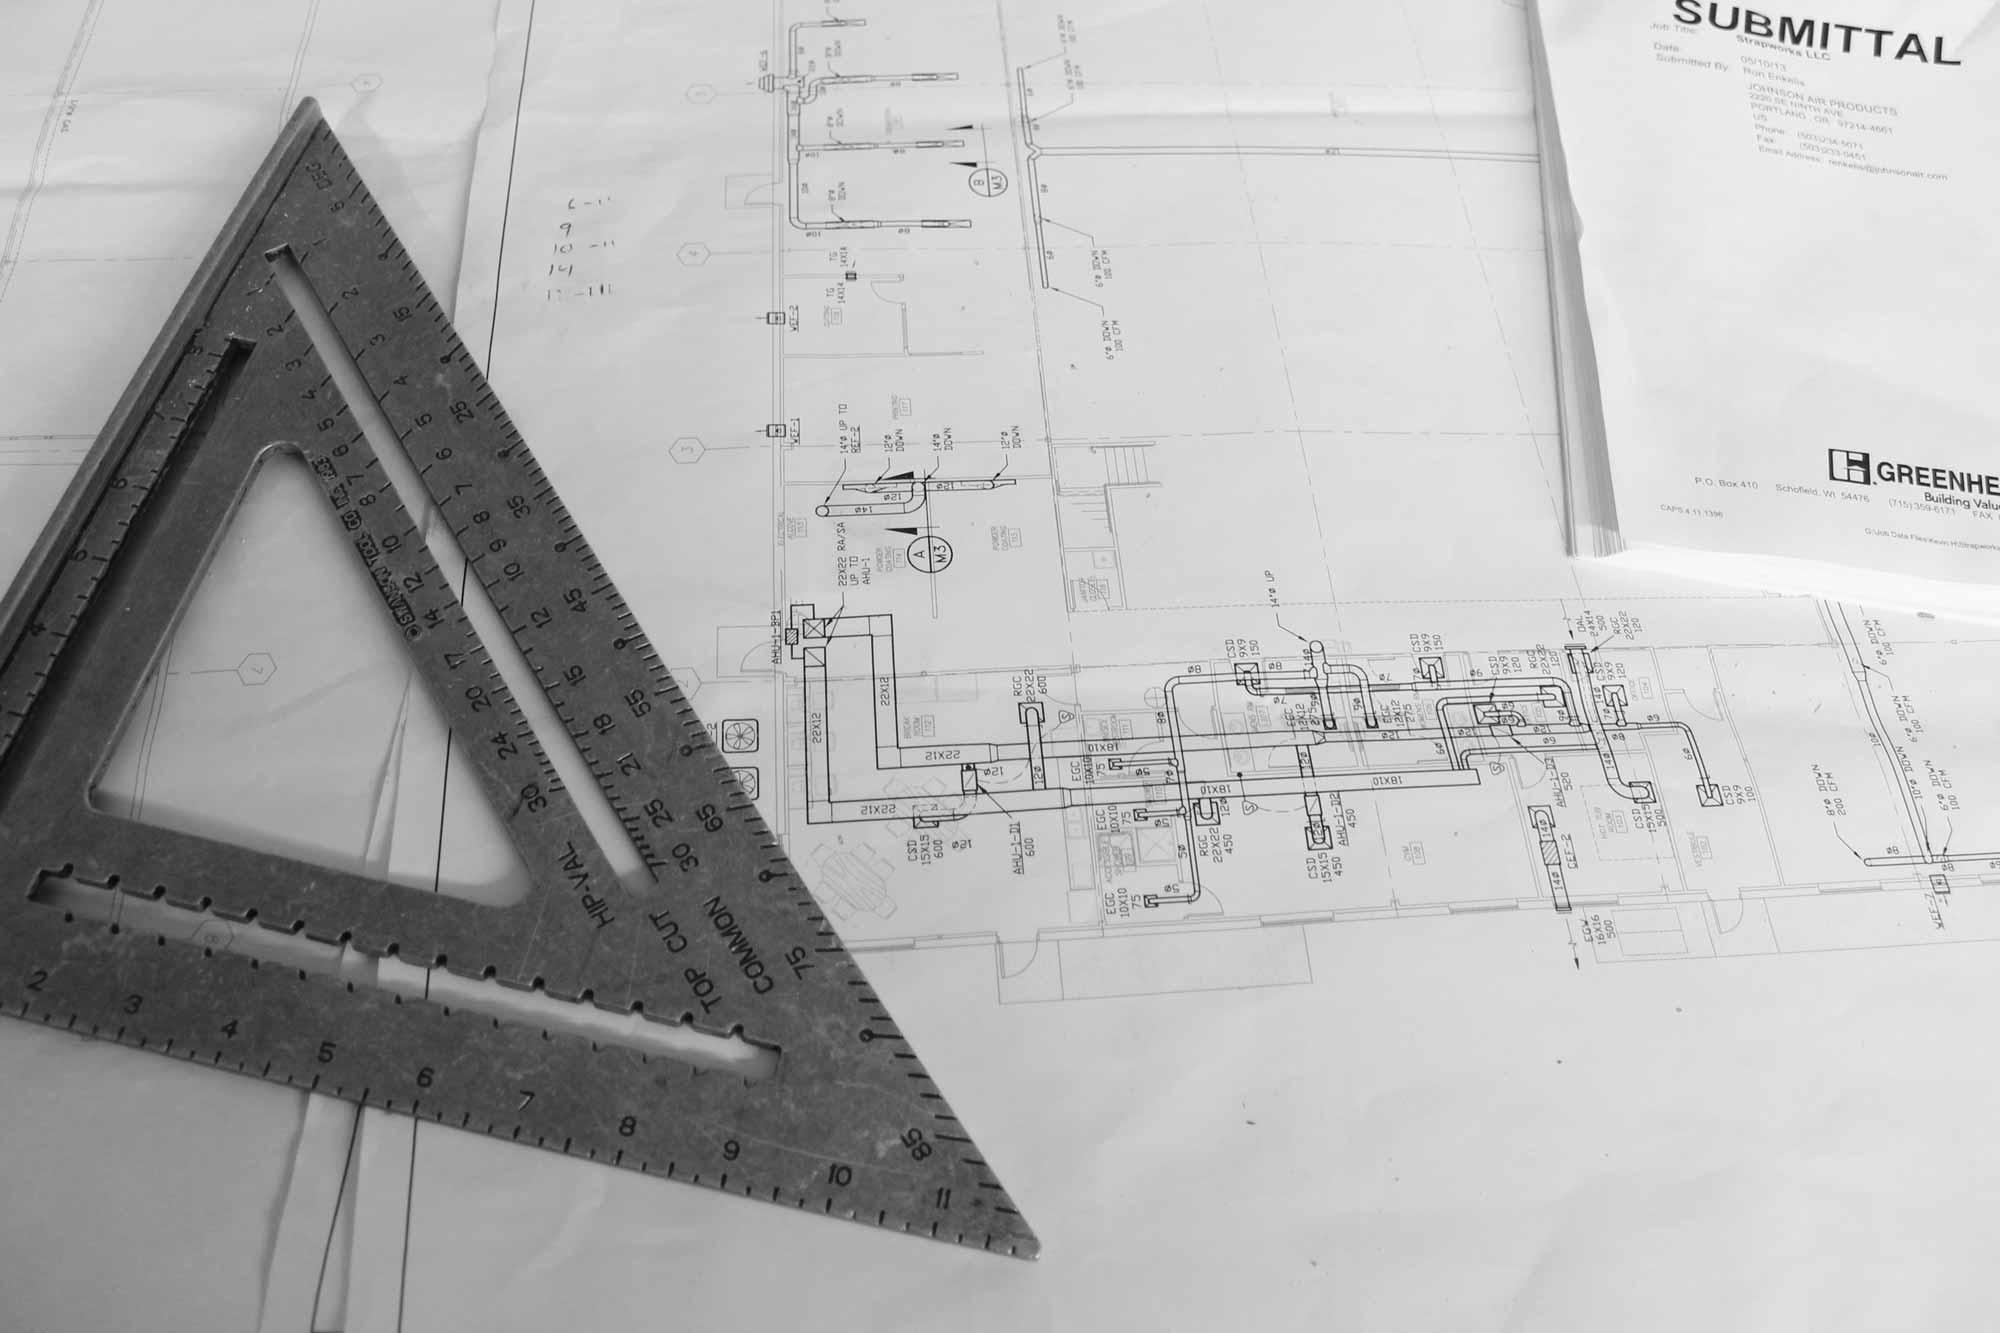 <p>Projektsteuerung mit Lean Construction</p>